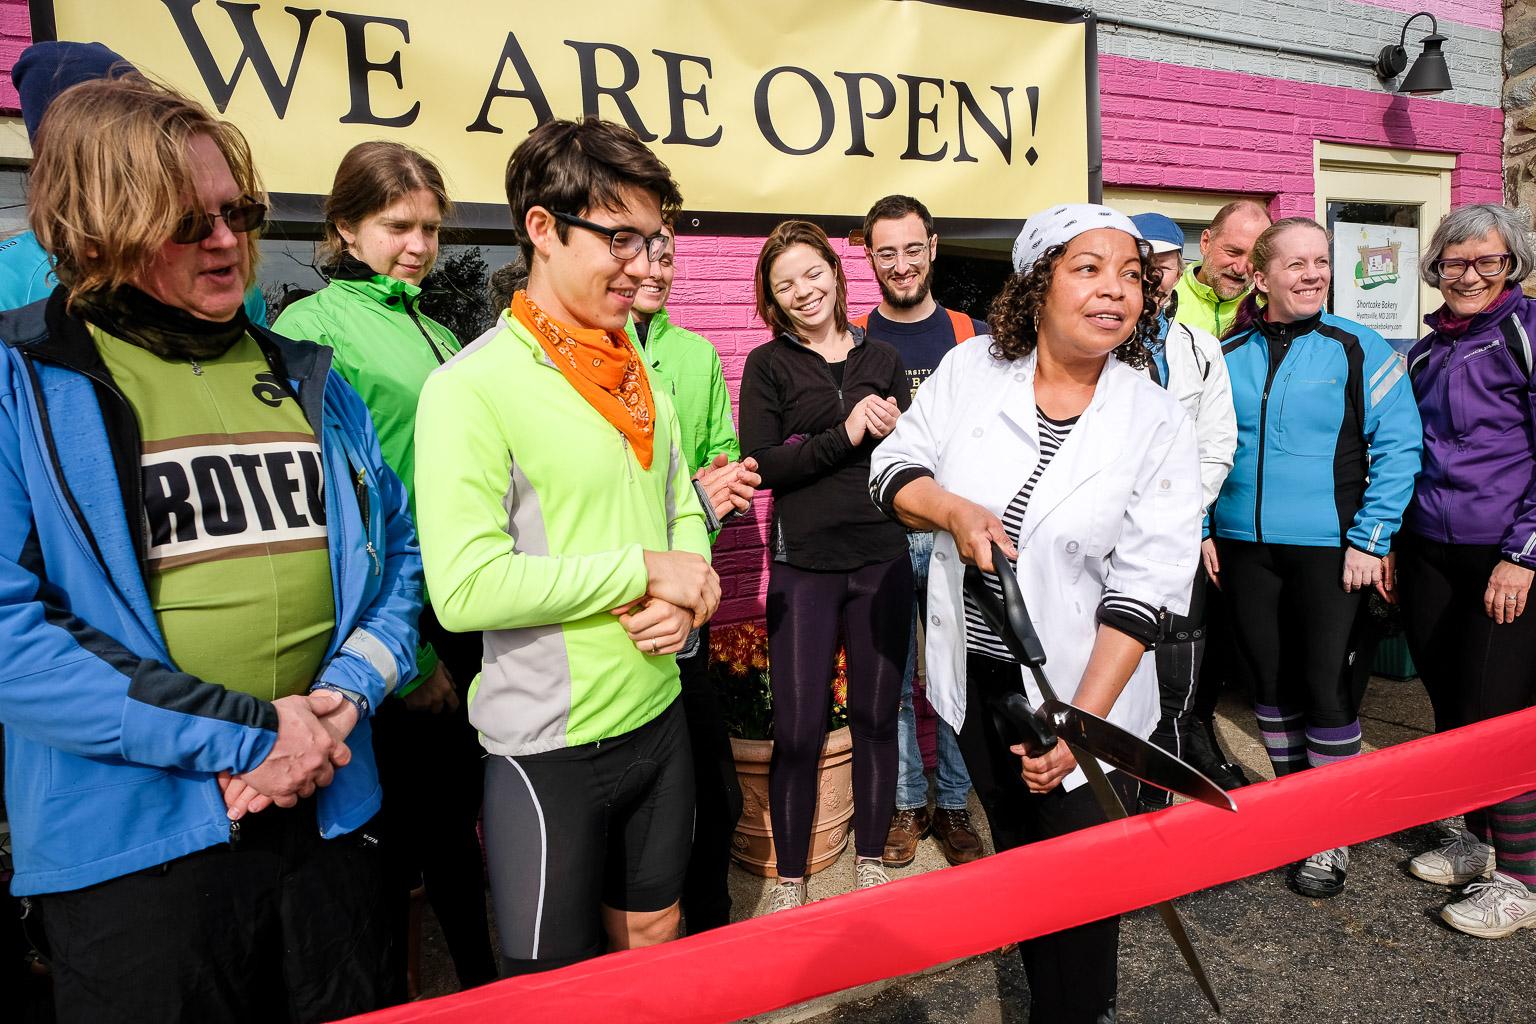 Shortcake_Reopening_11-18-17-045-Lenzy-Ruffin-Event-Photography-Washington-DC-Fuji-X-T2.jpg